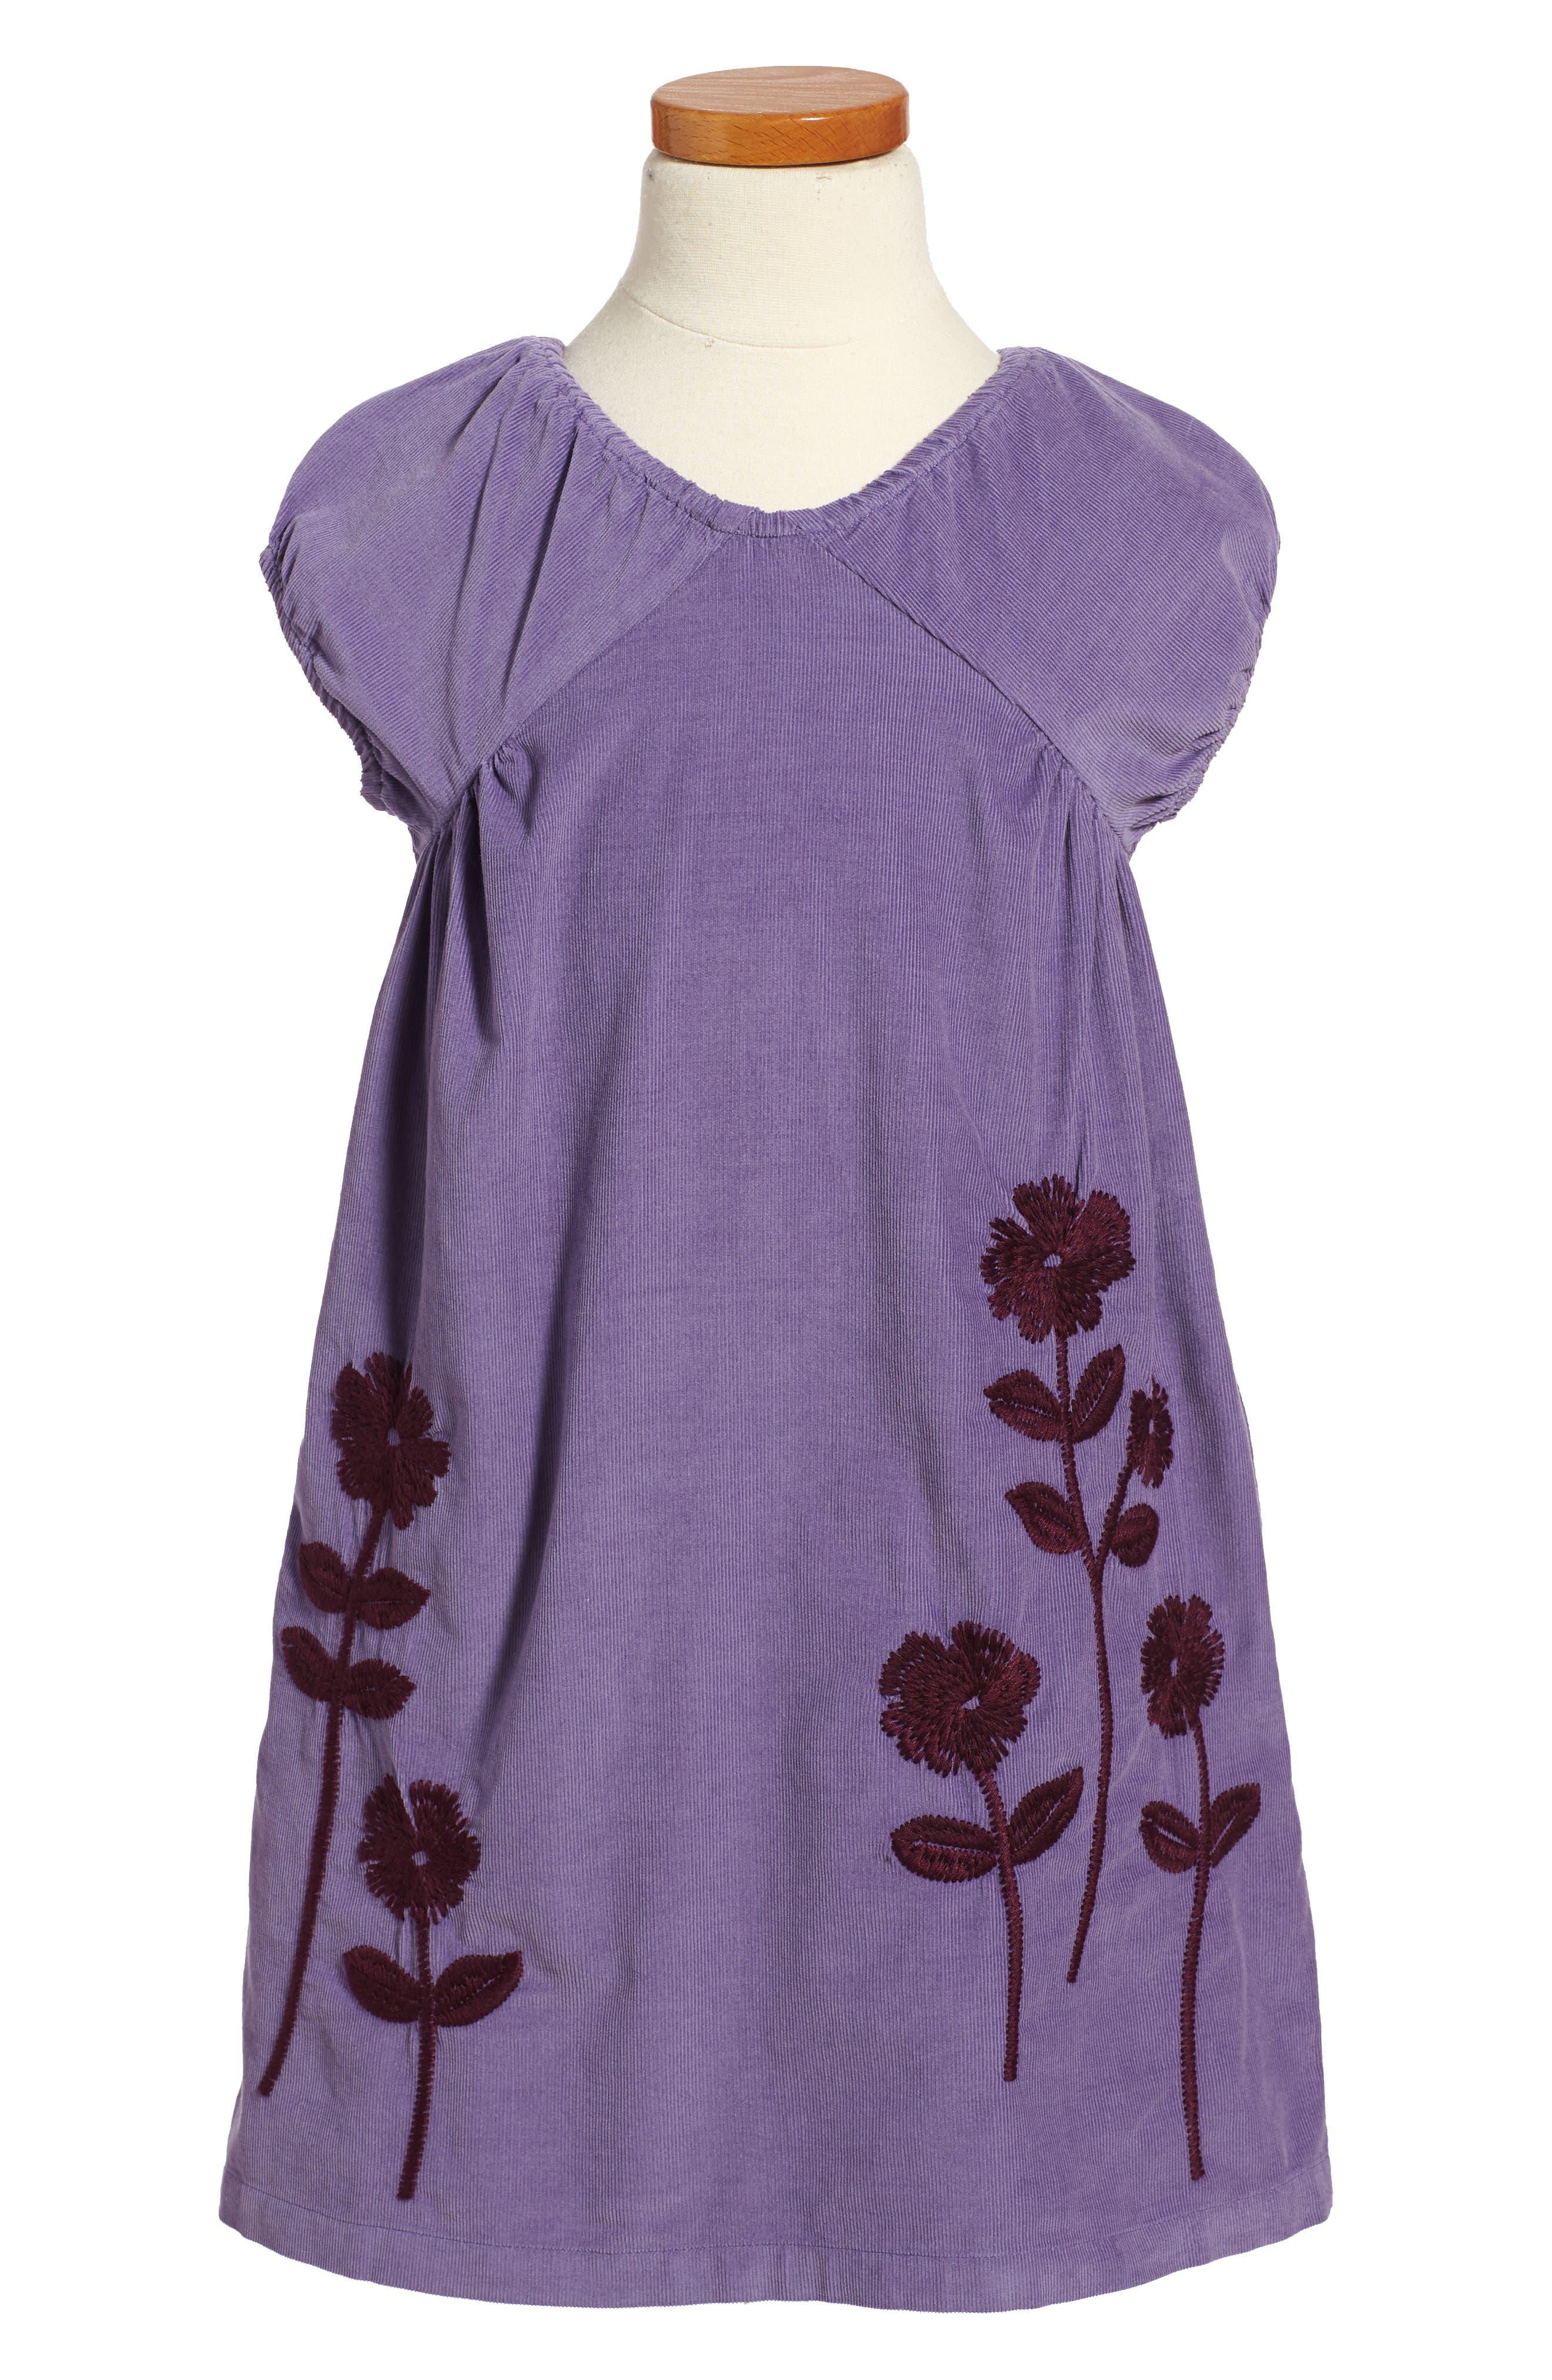 Cullodena Corduroy Dress,                         Main,                         color, Taffy